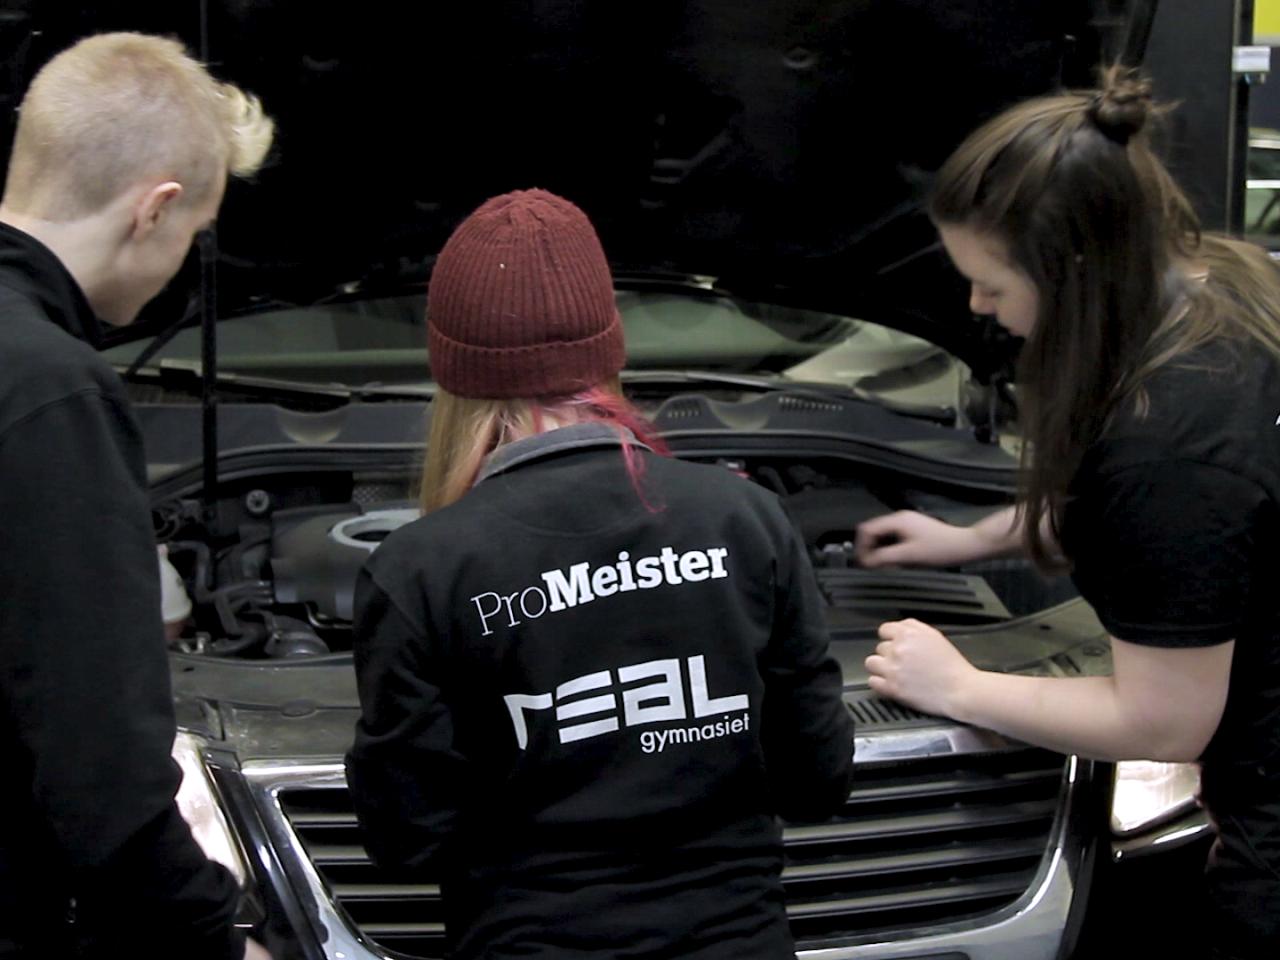 Realgymnasiet startar fordonsprogram i samarbete med ProMeister i Göteborg